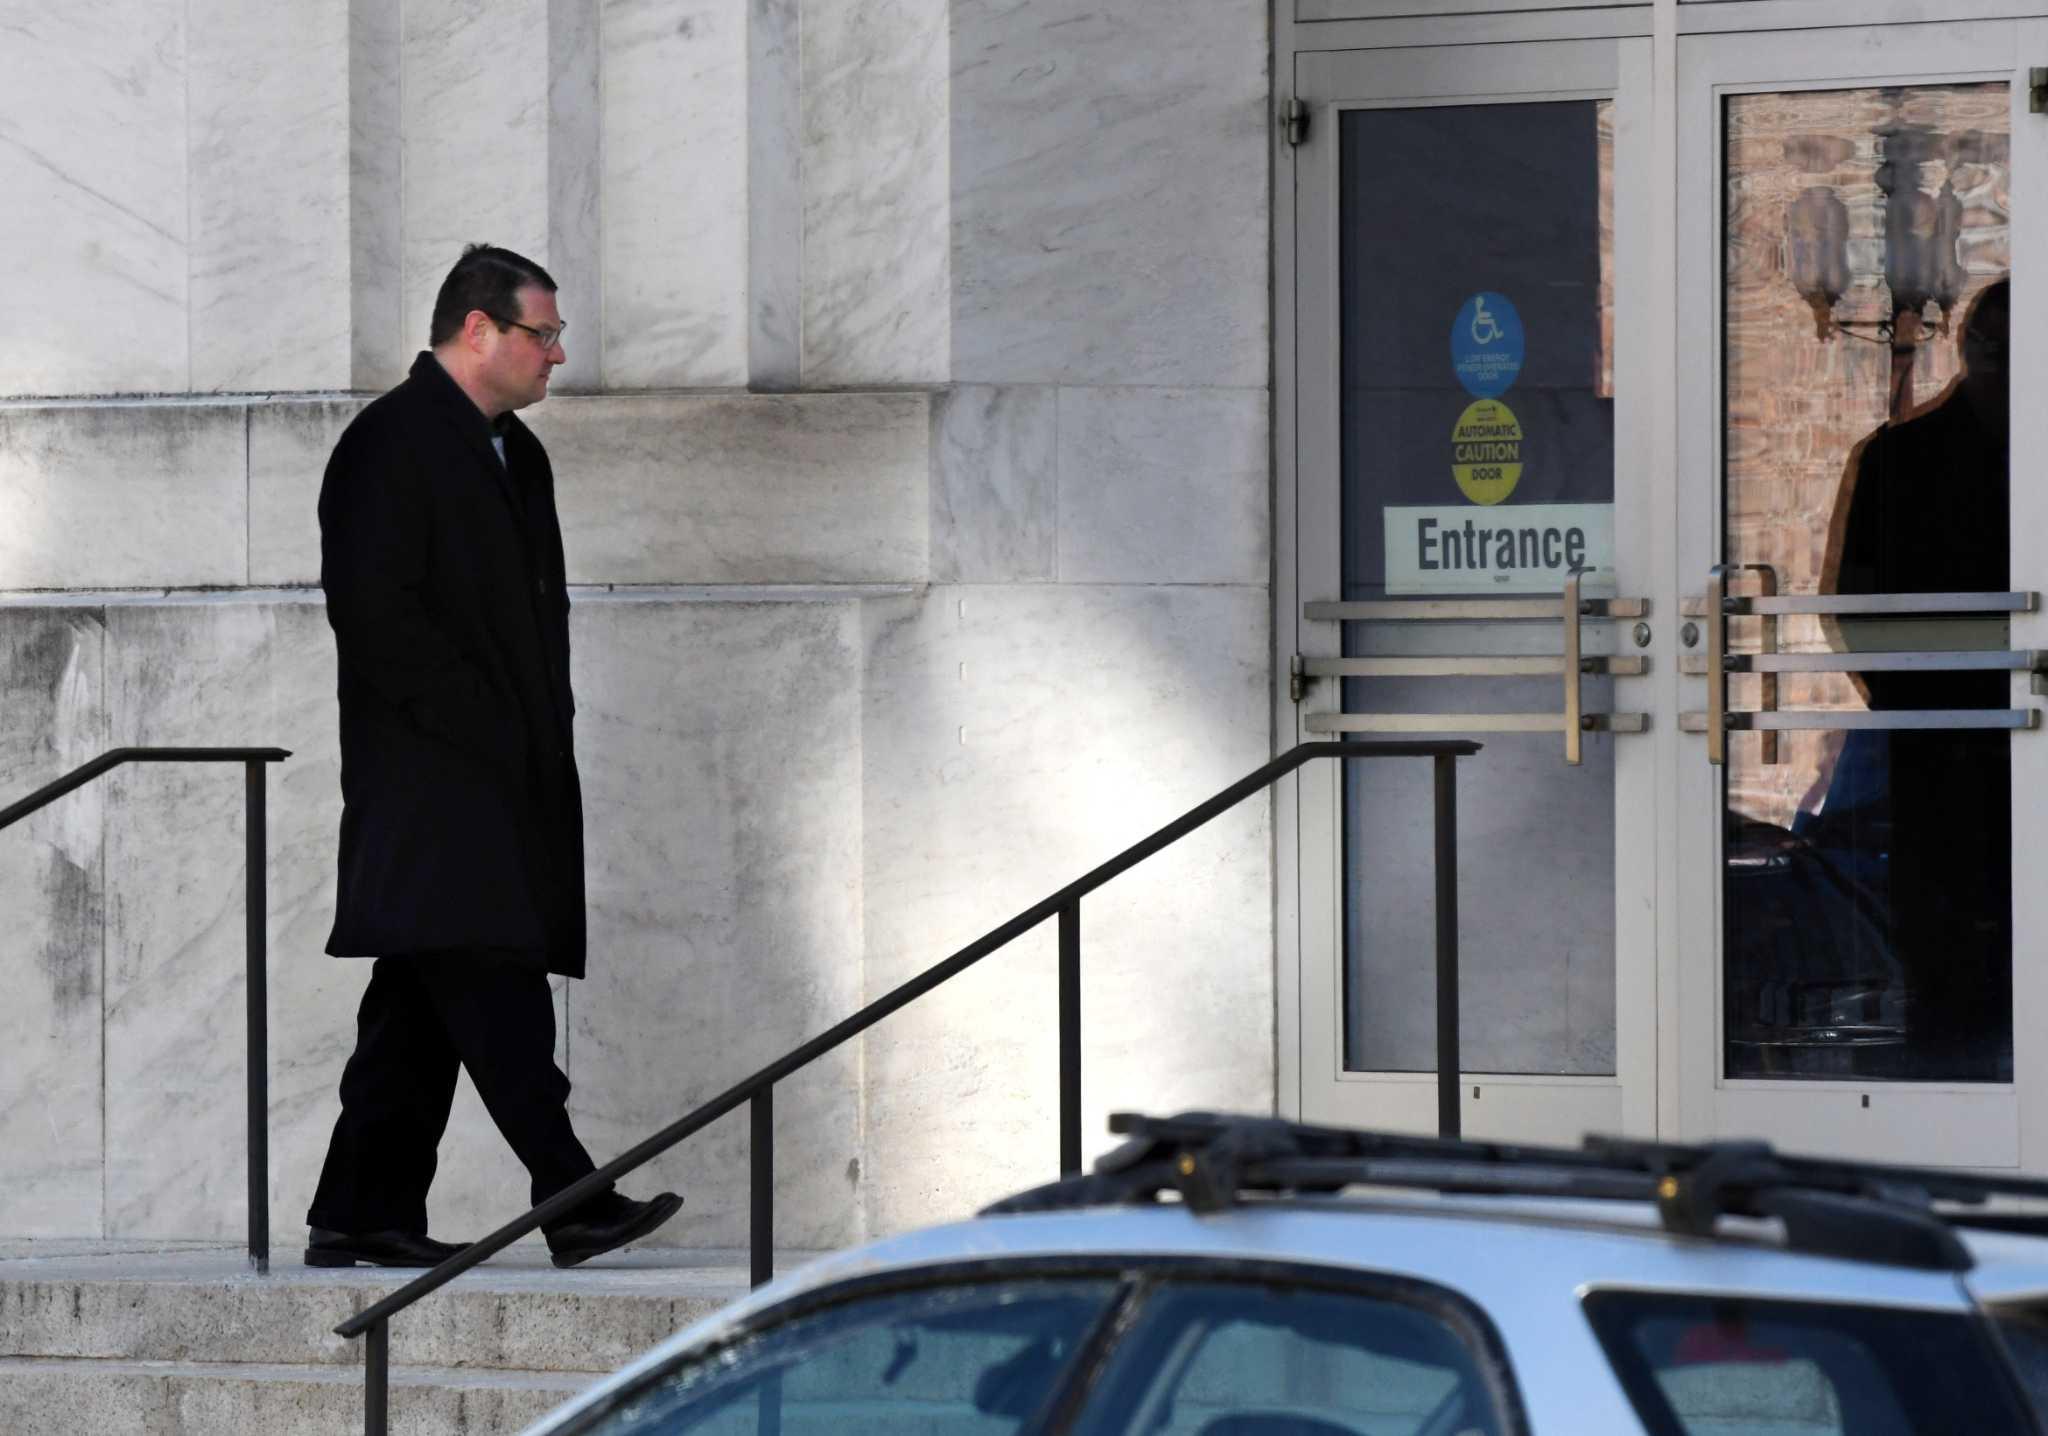 Signoracci sentenced to probation as Morse awaits fate